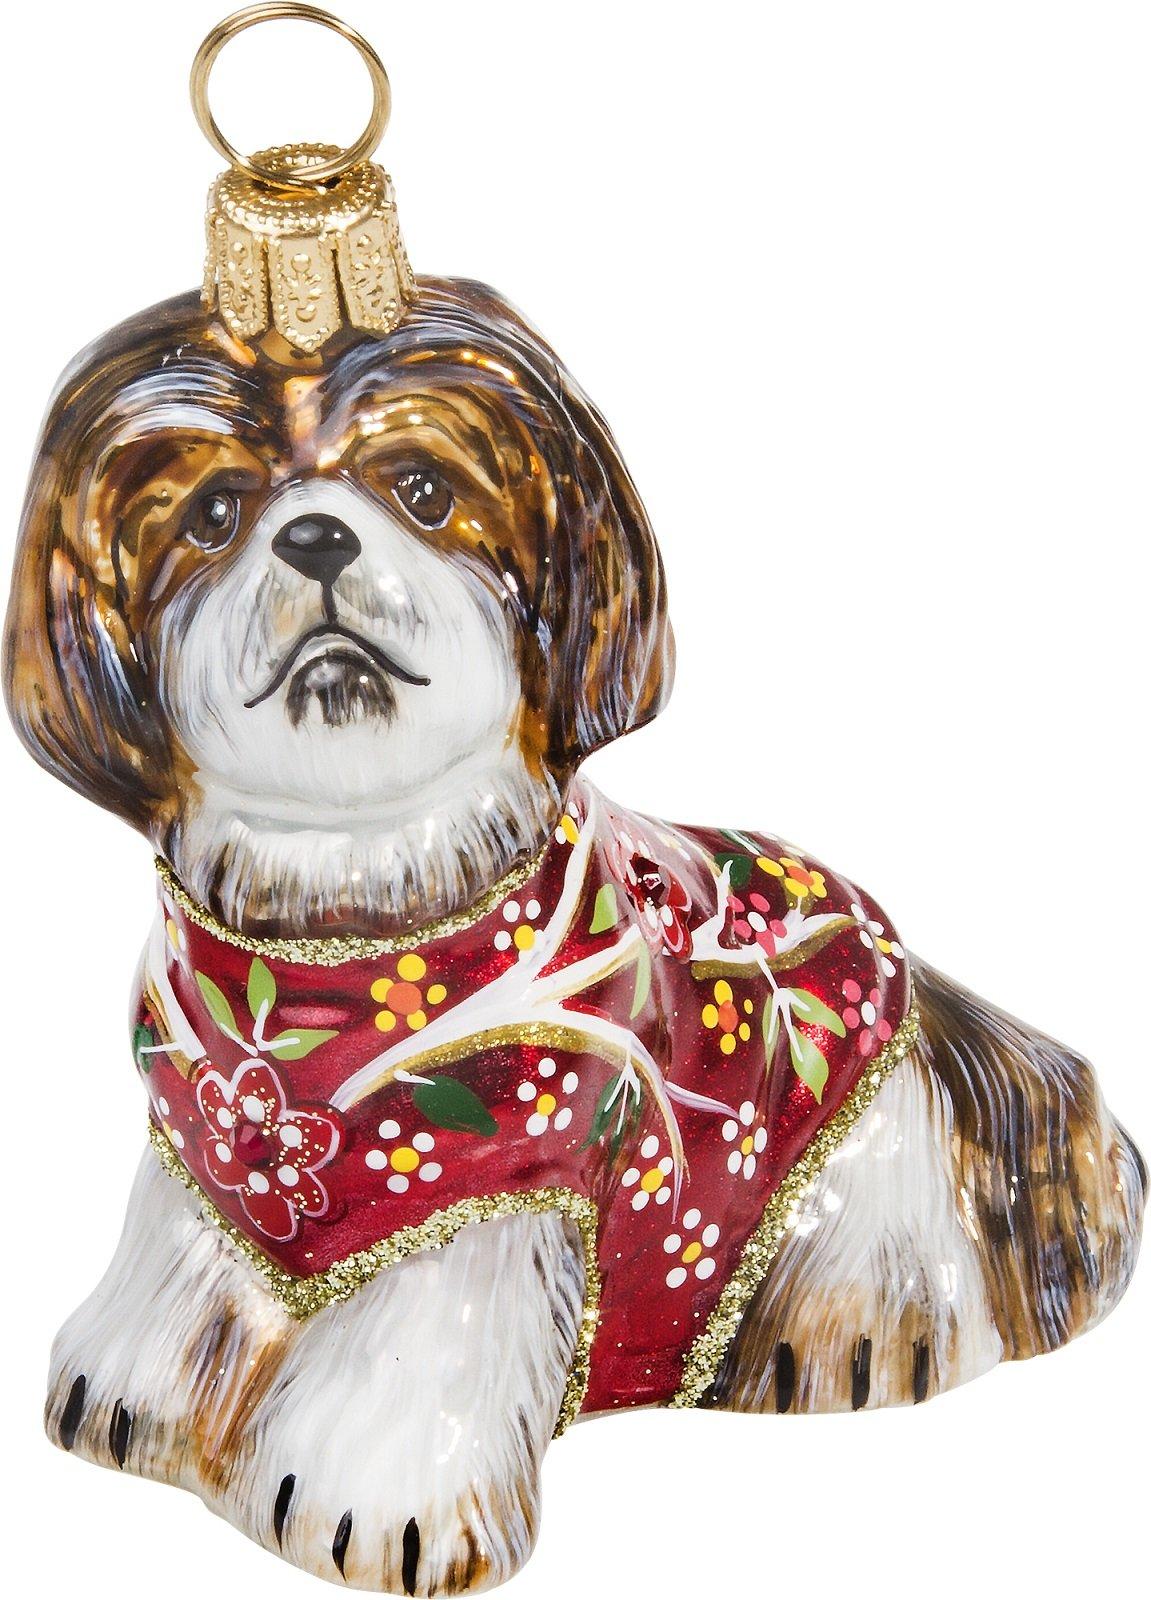 Joy-To-The-World-Brown-and-White-Shih-Tzu-in-A-Silk-Kimono-Polish-Glass-Christmas-Tree-Ornament